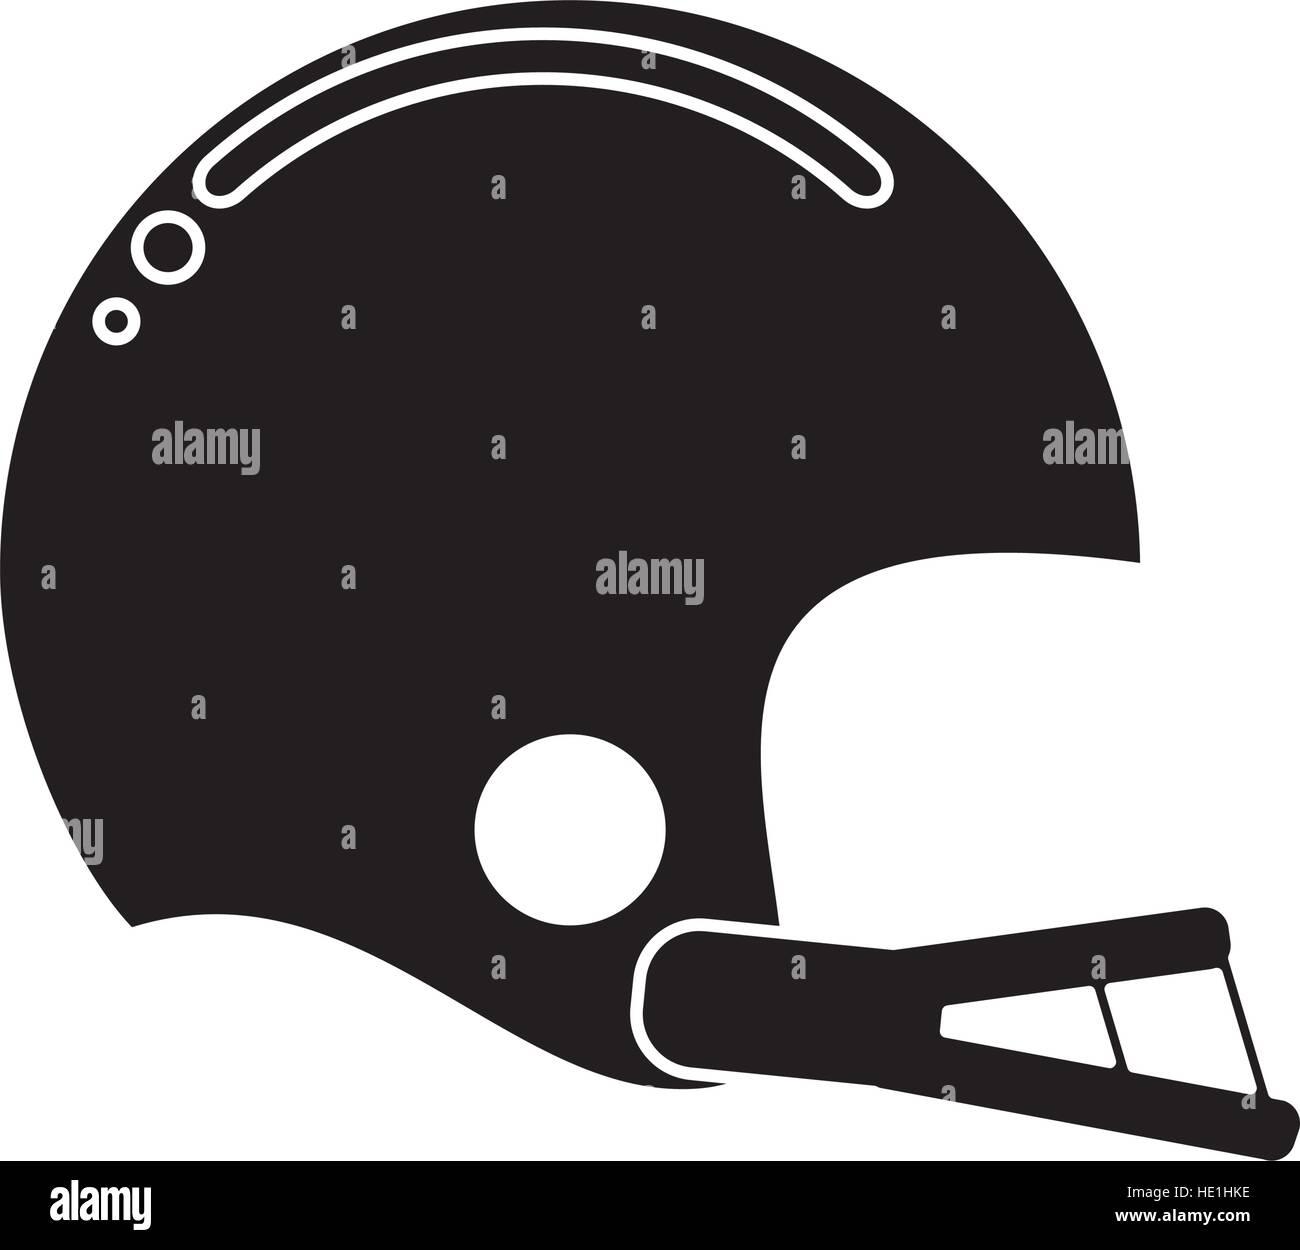 silhouette american football helmet sport vector illustration eps 10 - Stock Vector